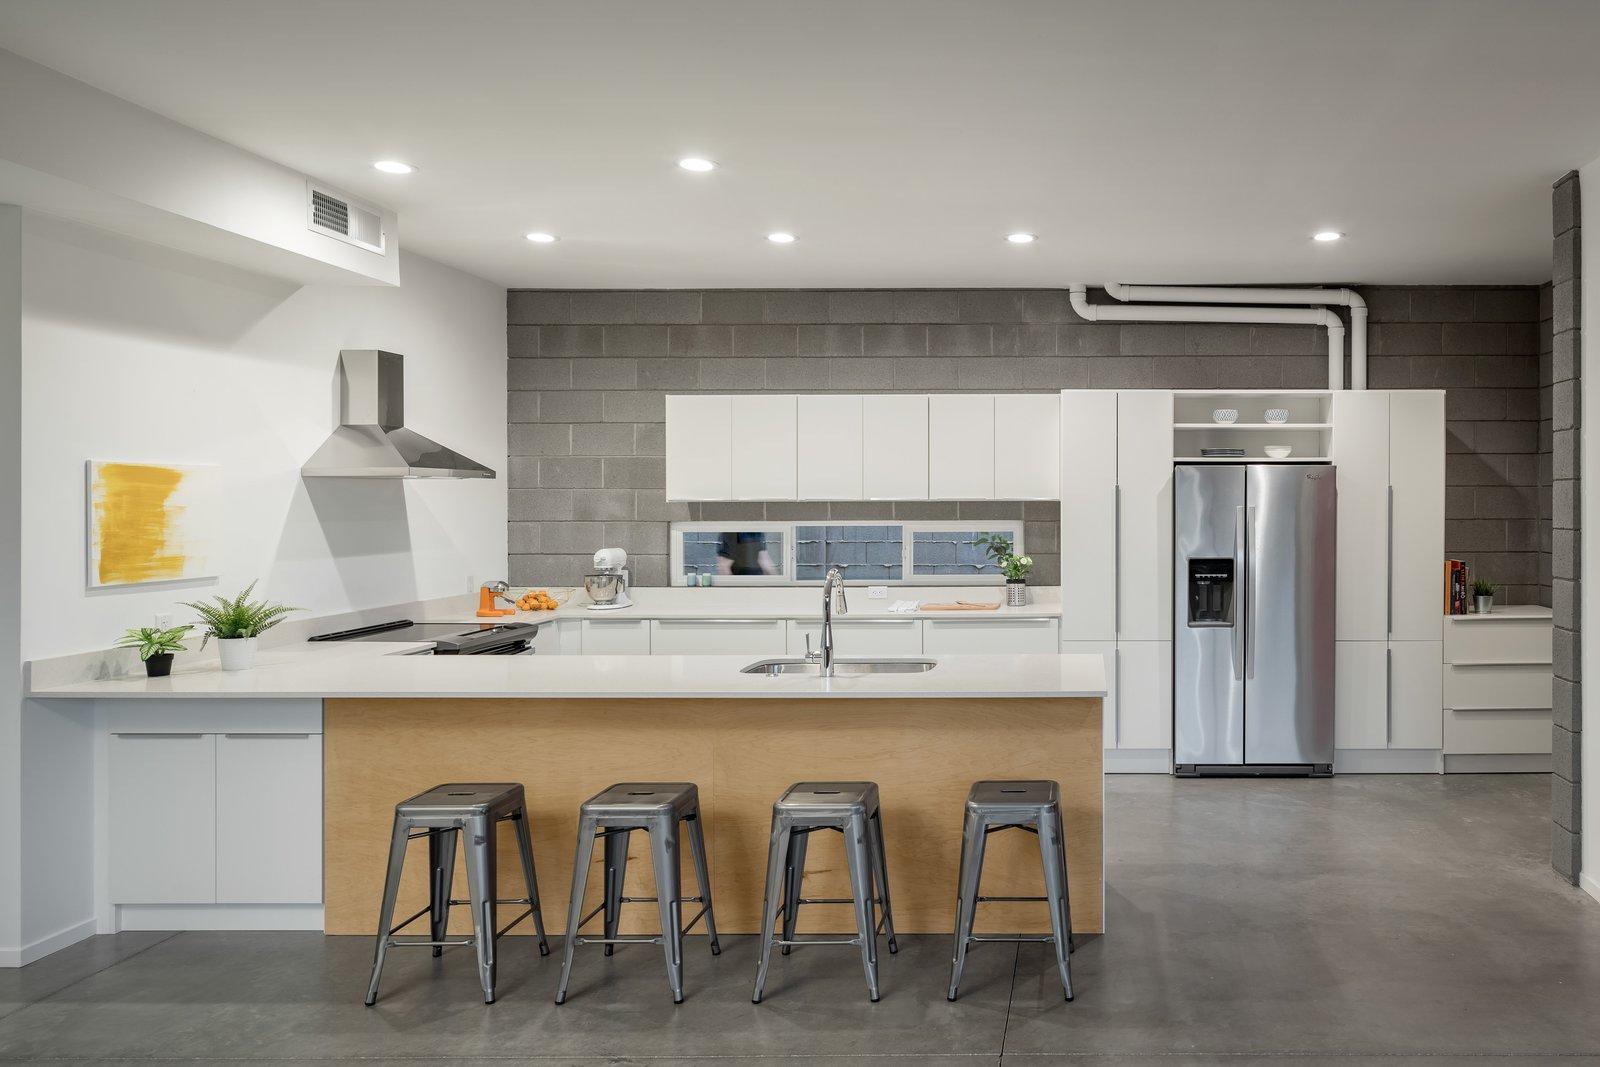 Tagged: Kitchen, White, Quartzite, Concrete, Recessed, Refrigerator, Range Hood, Undermount, and Range.  Best Kitchen Refrigerator Quartzite Photos from The Fillmore Duplex